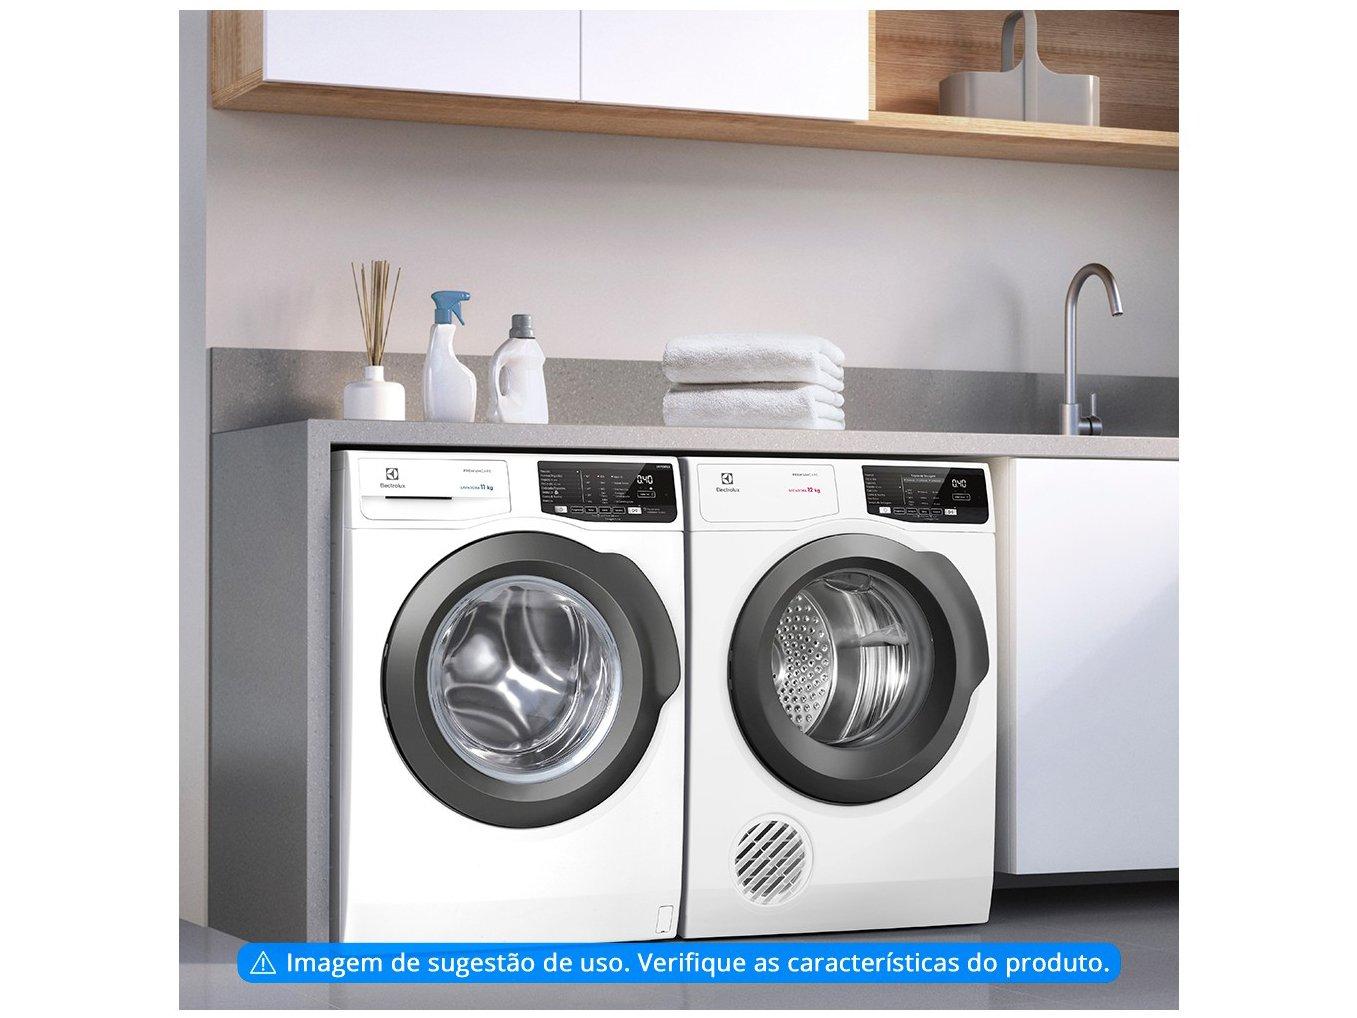 Lavadora de Roupas Electrolux Premium Care LFE11 - 11kg Cesto Inox 8 Programas de Lavagem - 220 V - 3